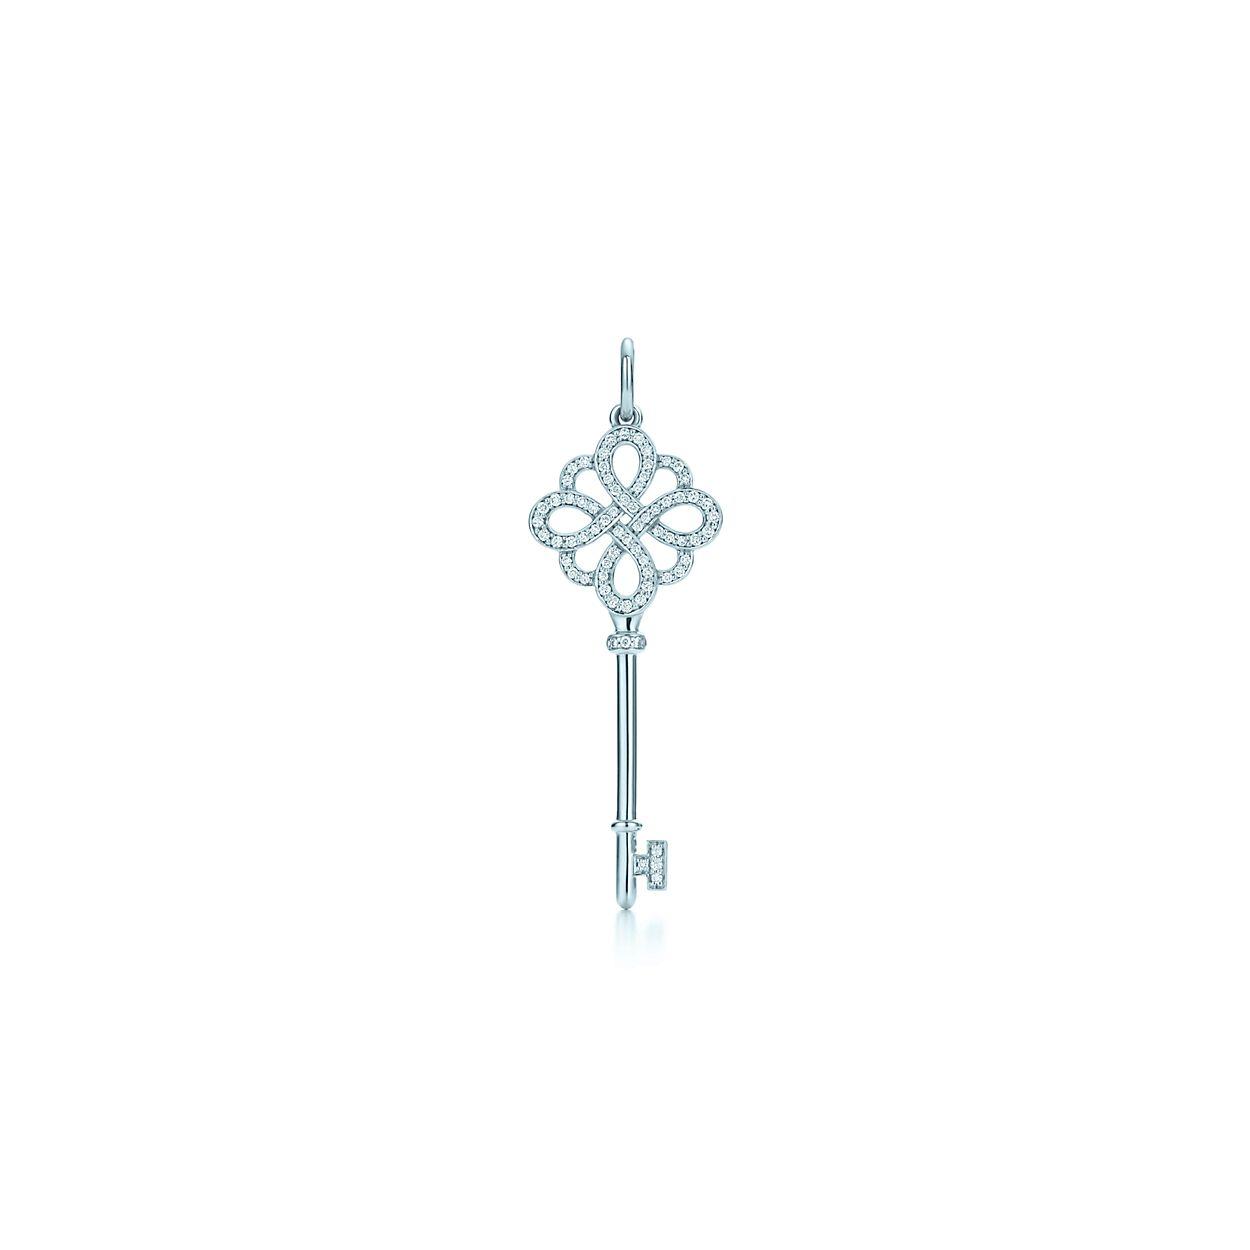 66ac183db4c2c Pendente chave Knot Tiffany Keys em ouro branco 18k com diamantes ...